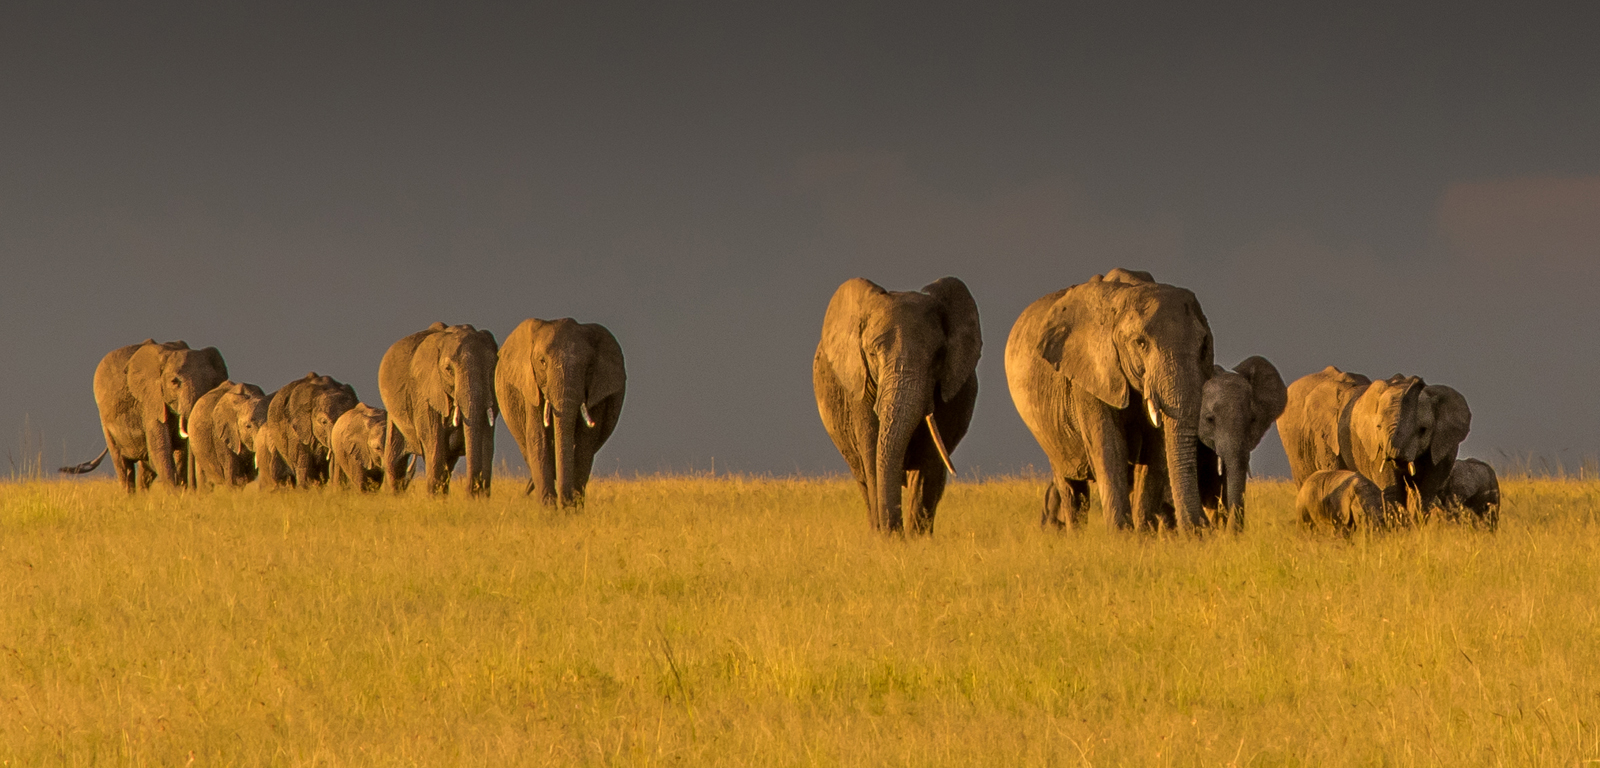 Storm Approaching Elephants Gathering